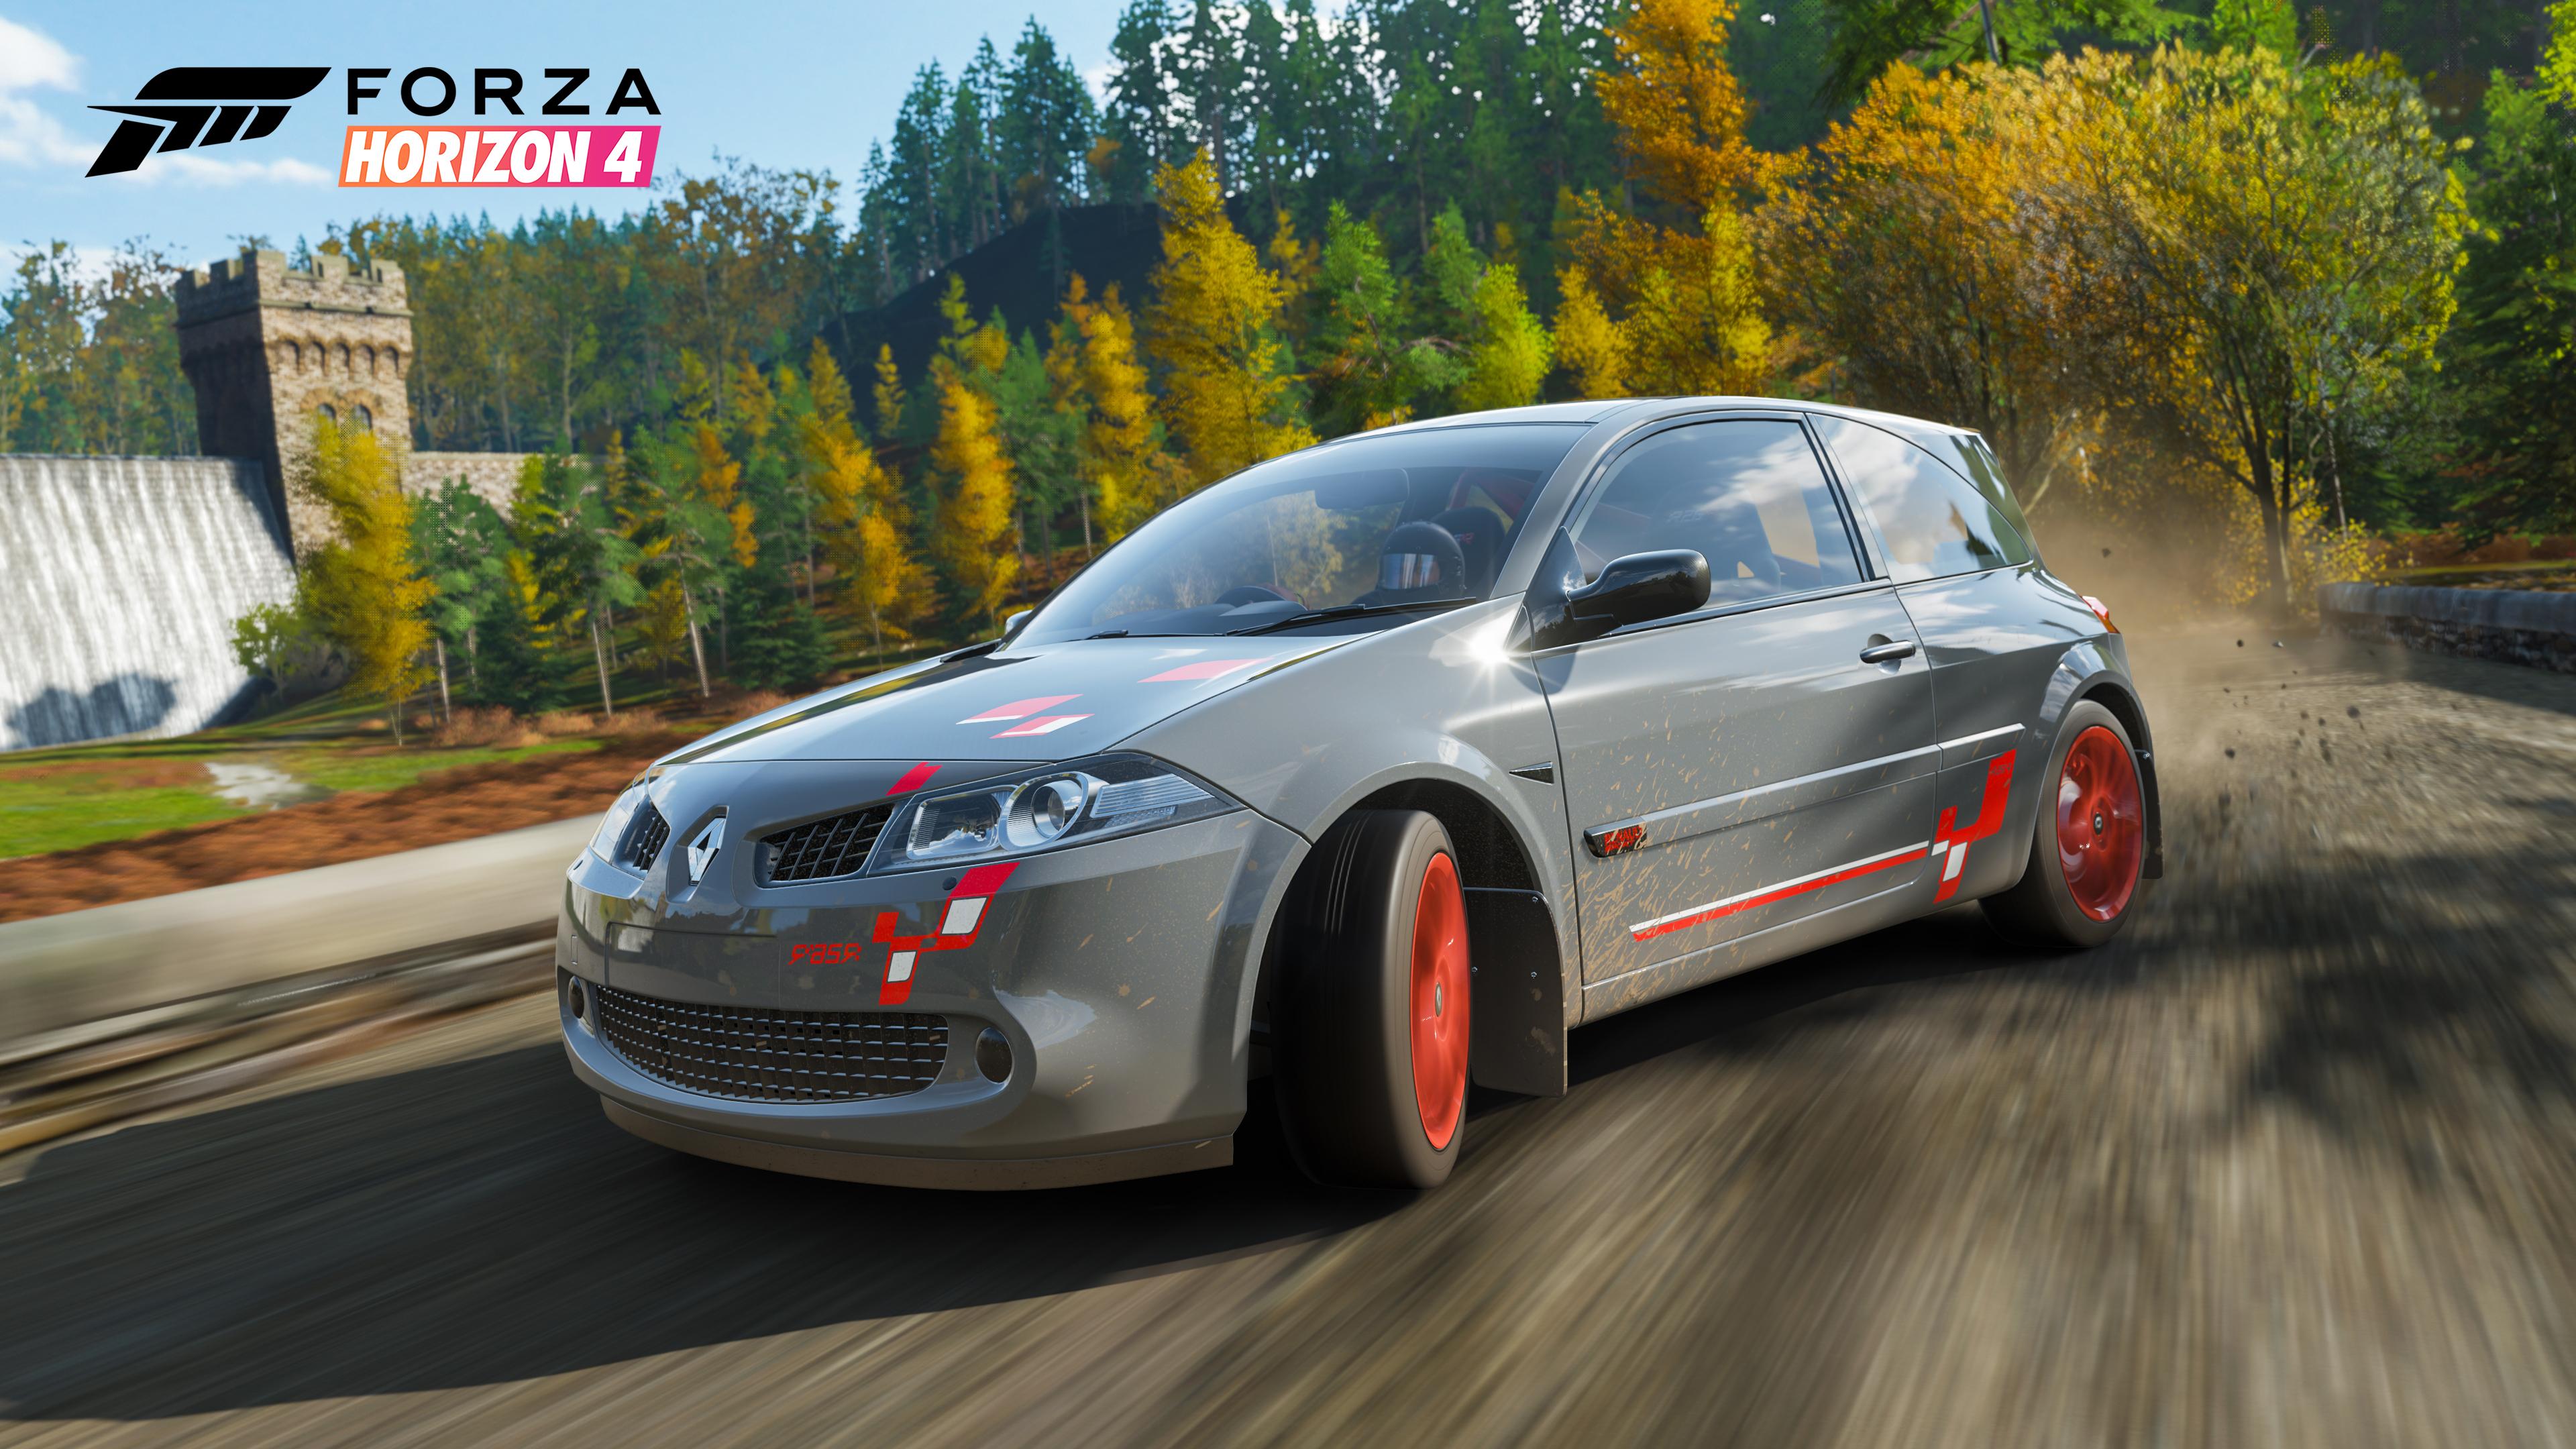 Forza Motorsport Forza Horizon 4 Series 17 Update